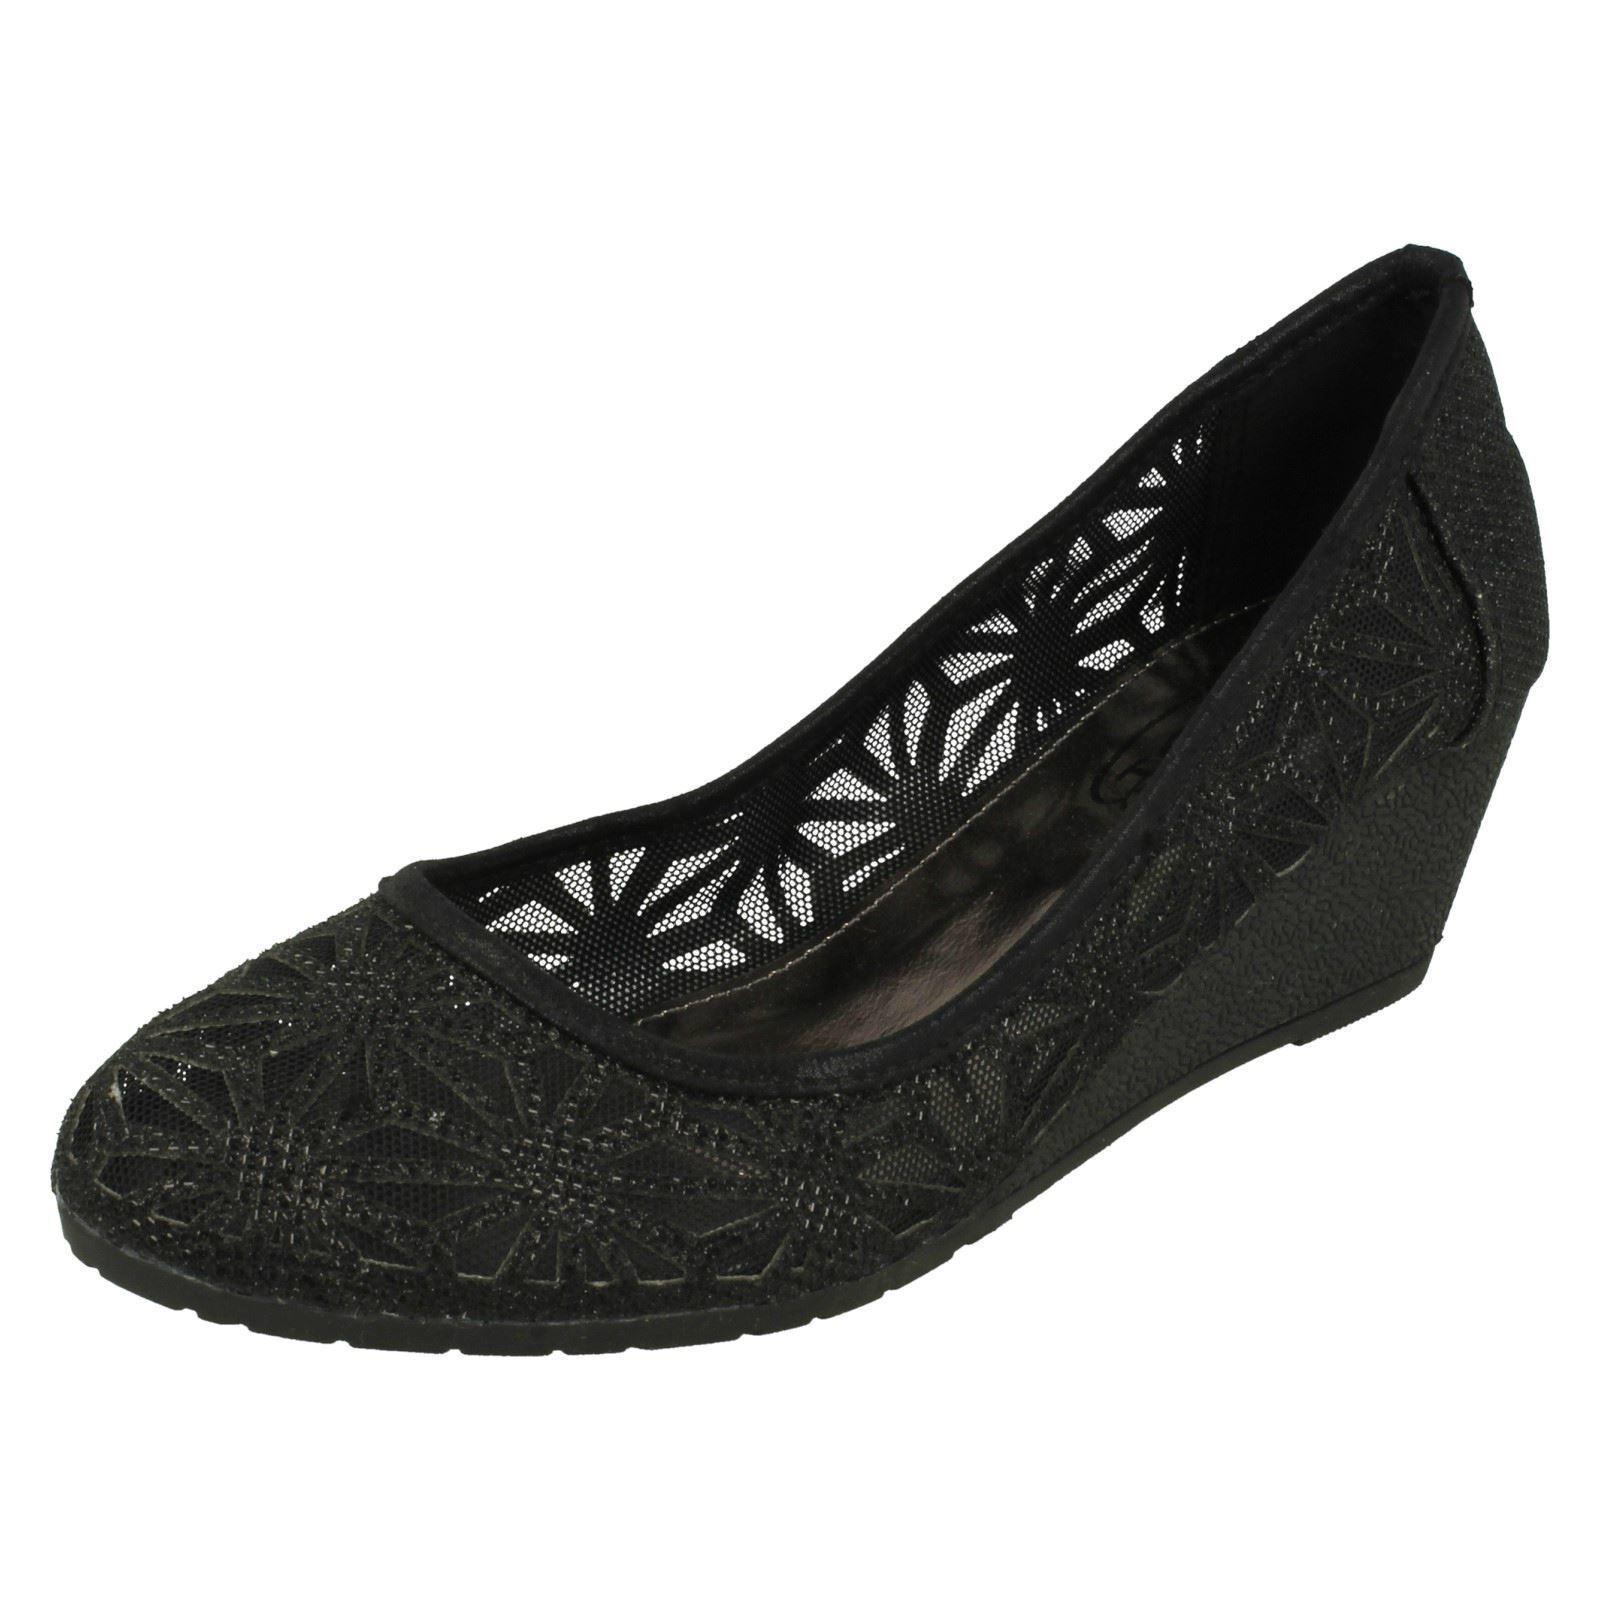 Spot On Glitter F9874 Ladies Black Synthetic Glitter On Effect Ballerina Court Shoes ddea2f